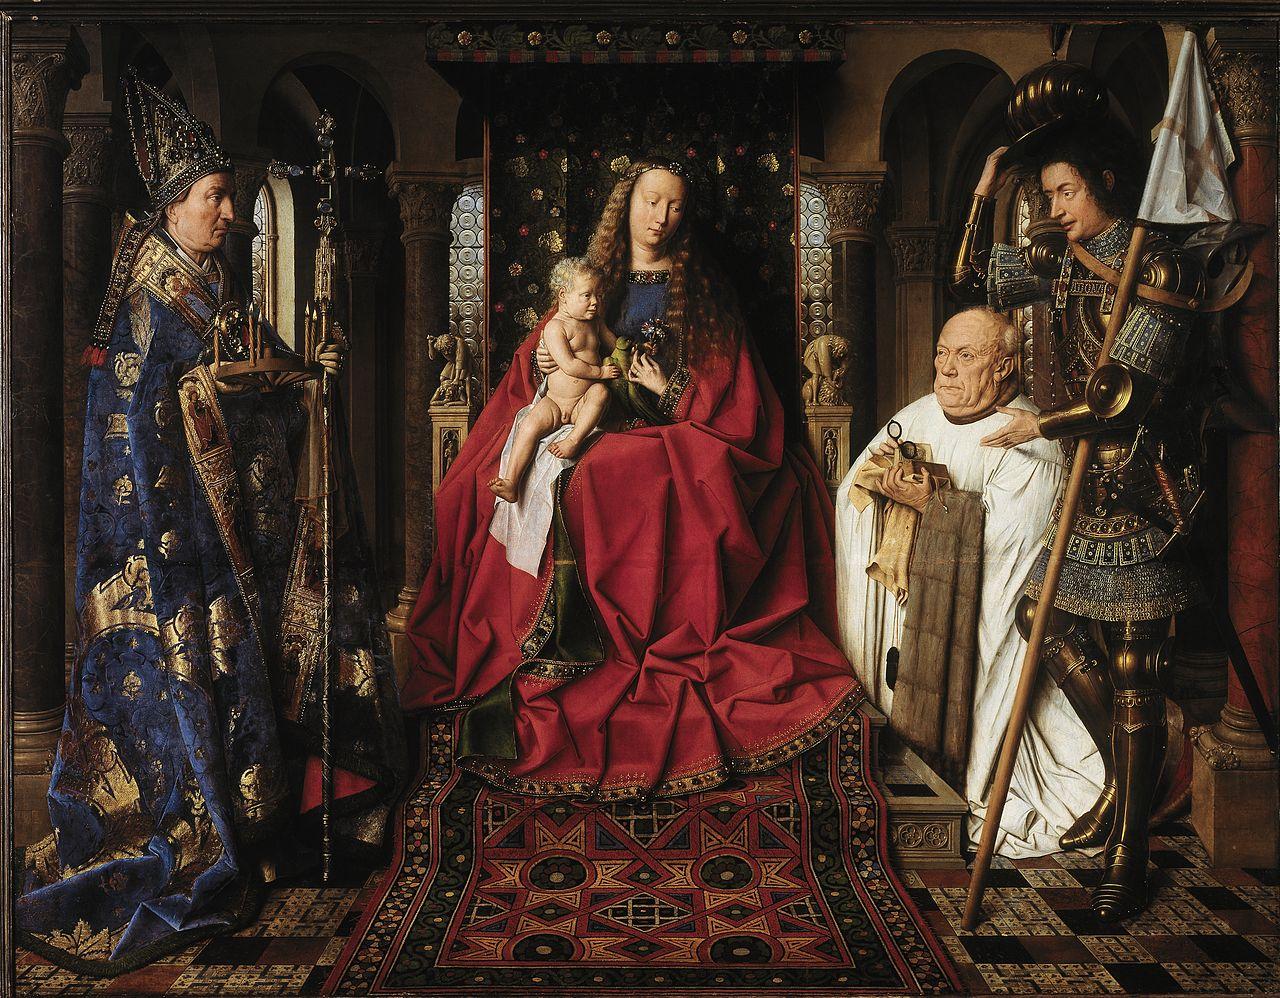 Jan van Eyck, La Madonna del canonico van der Paele (1436; olio su tavola, 122,1 x 157,8 cm; Bruges, Groeningemuseum)